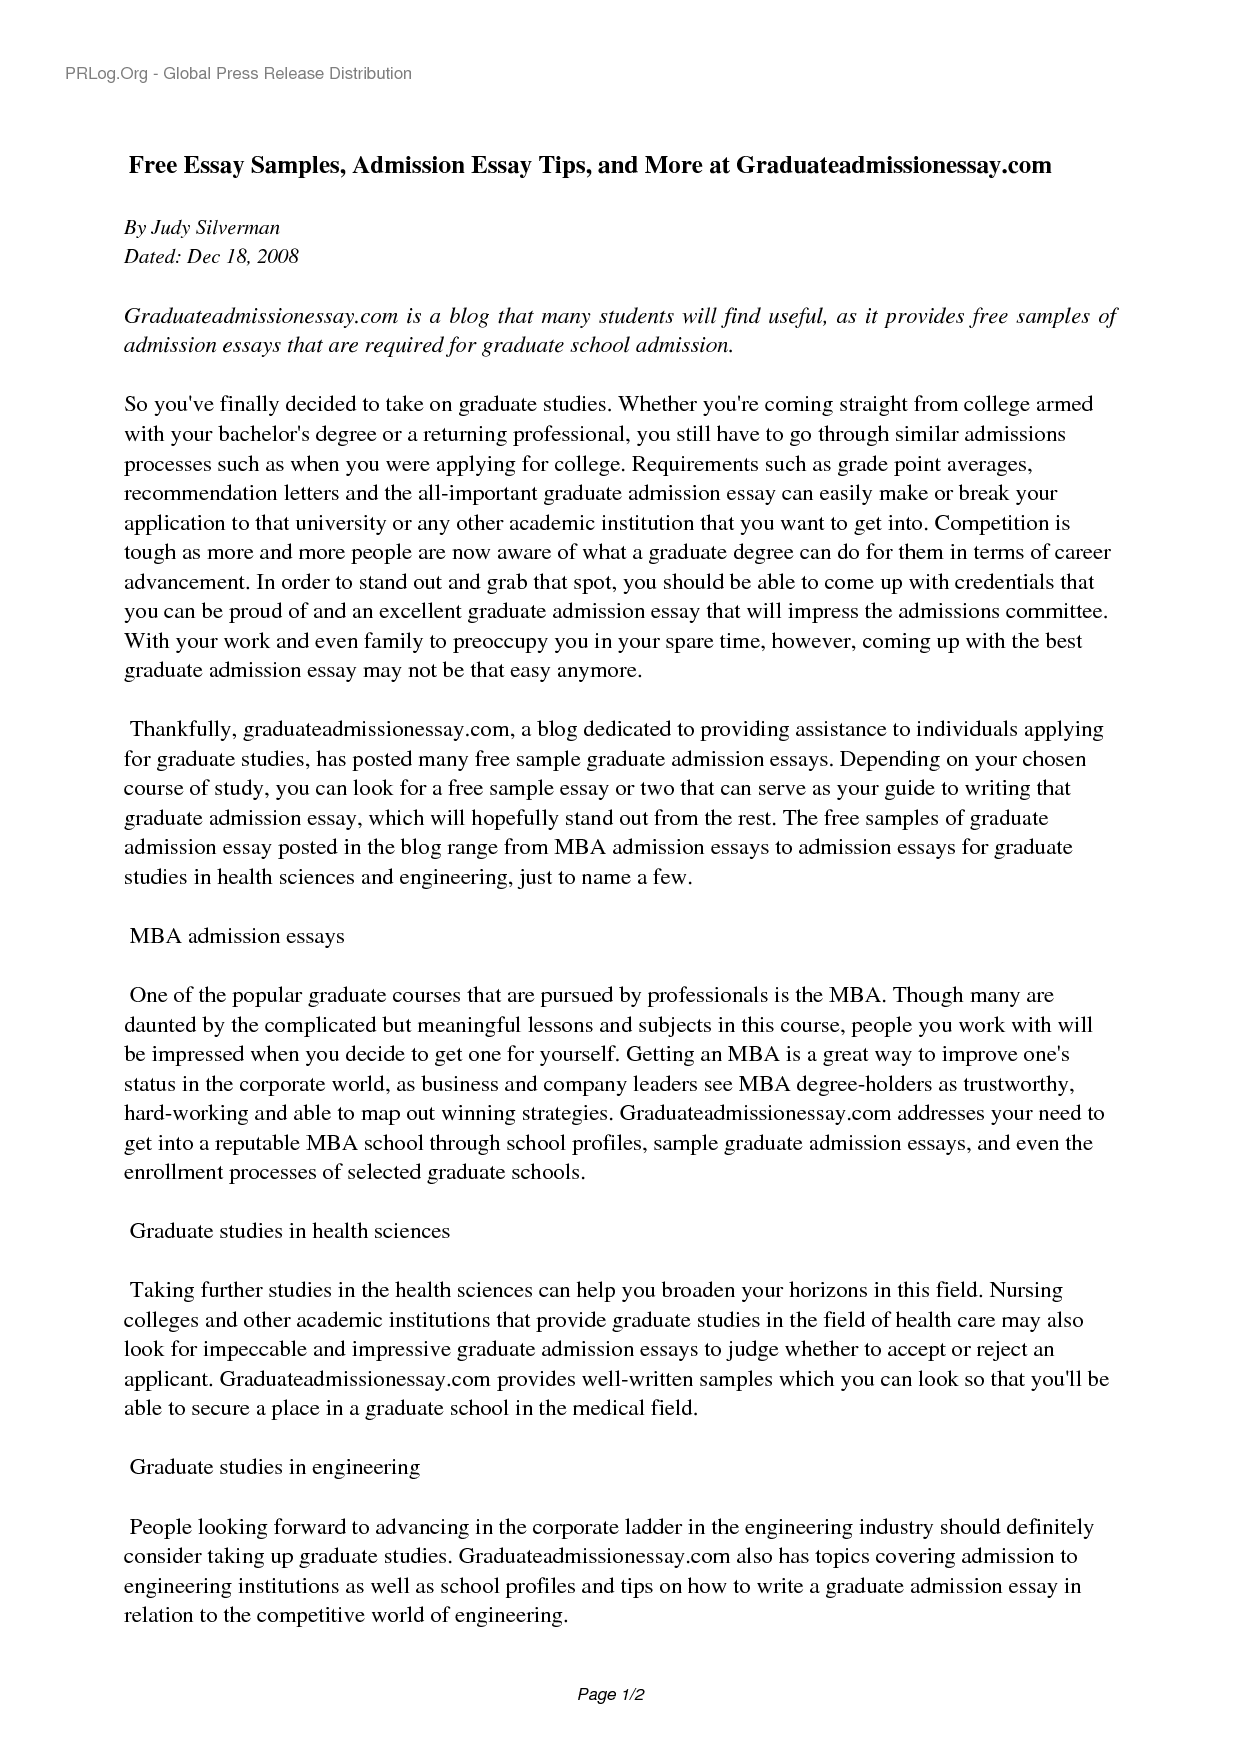 002 Essay Example Student Resume Internship Graduate School Template Motivational Letter Postgraduate Studies Solutions Grad Application Examples Cover Cute Applying Motivation Frightening Admission Social Work Format Full